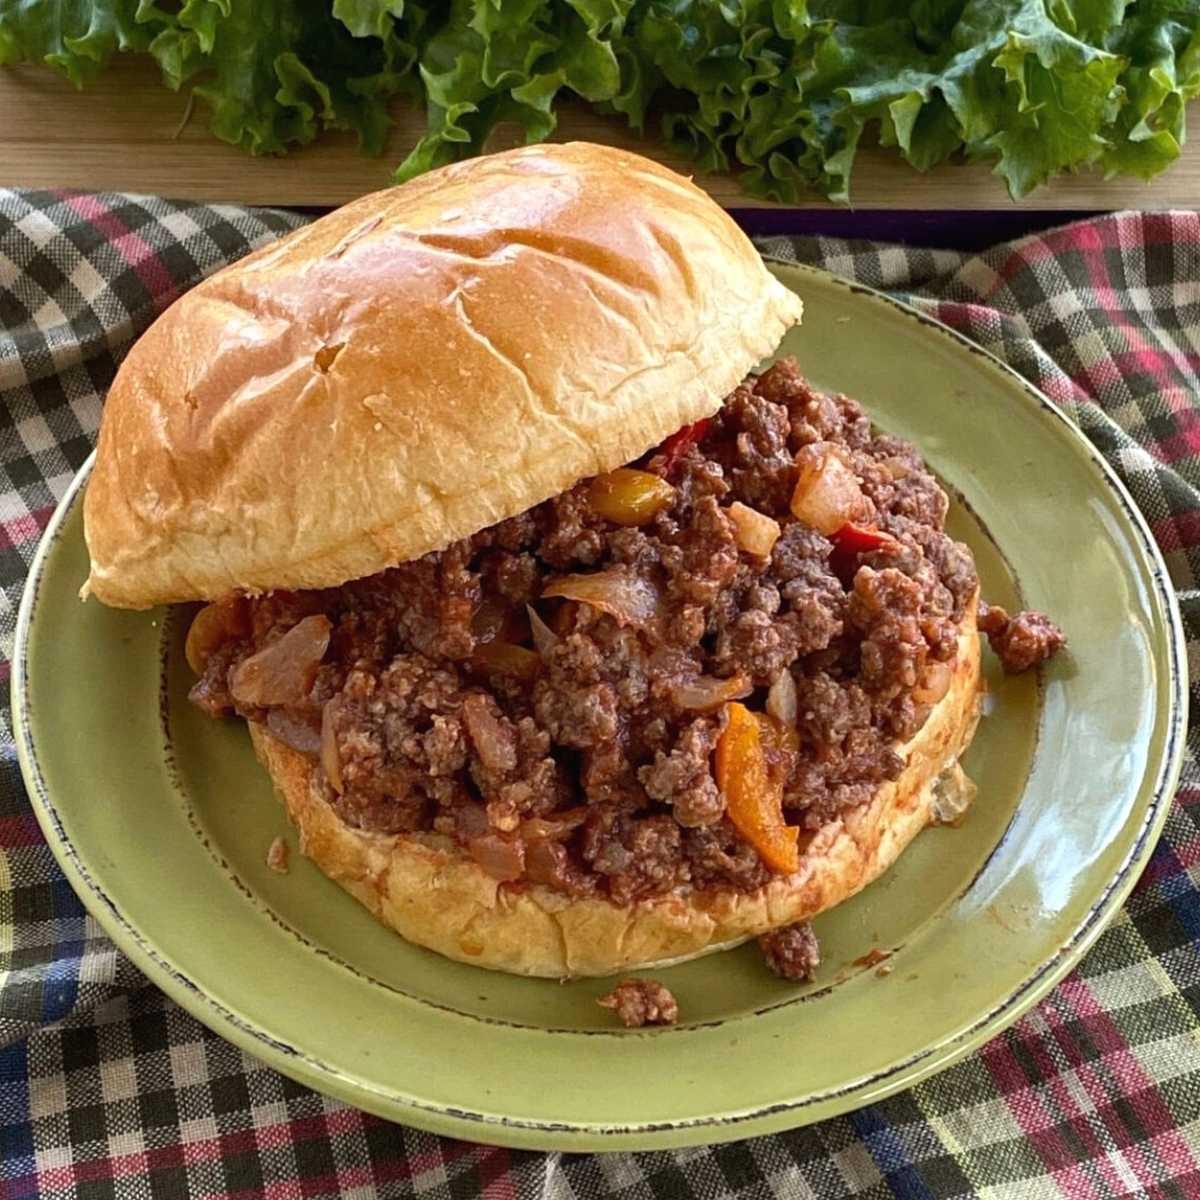 Sloppy Joe on brioche hamburger bun on plate with lettuce leaves behind it.